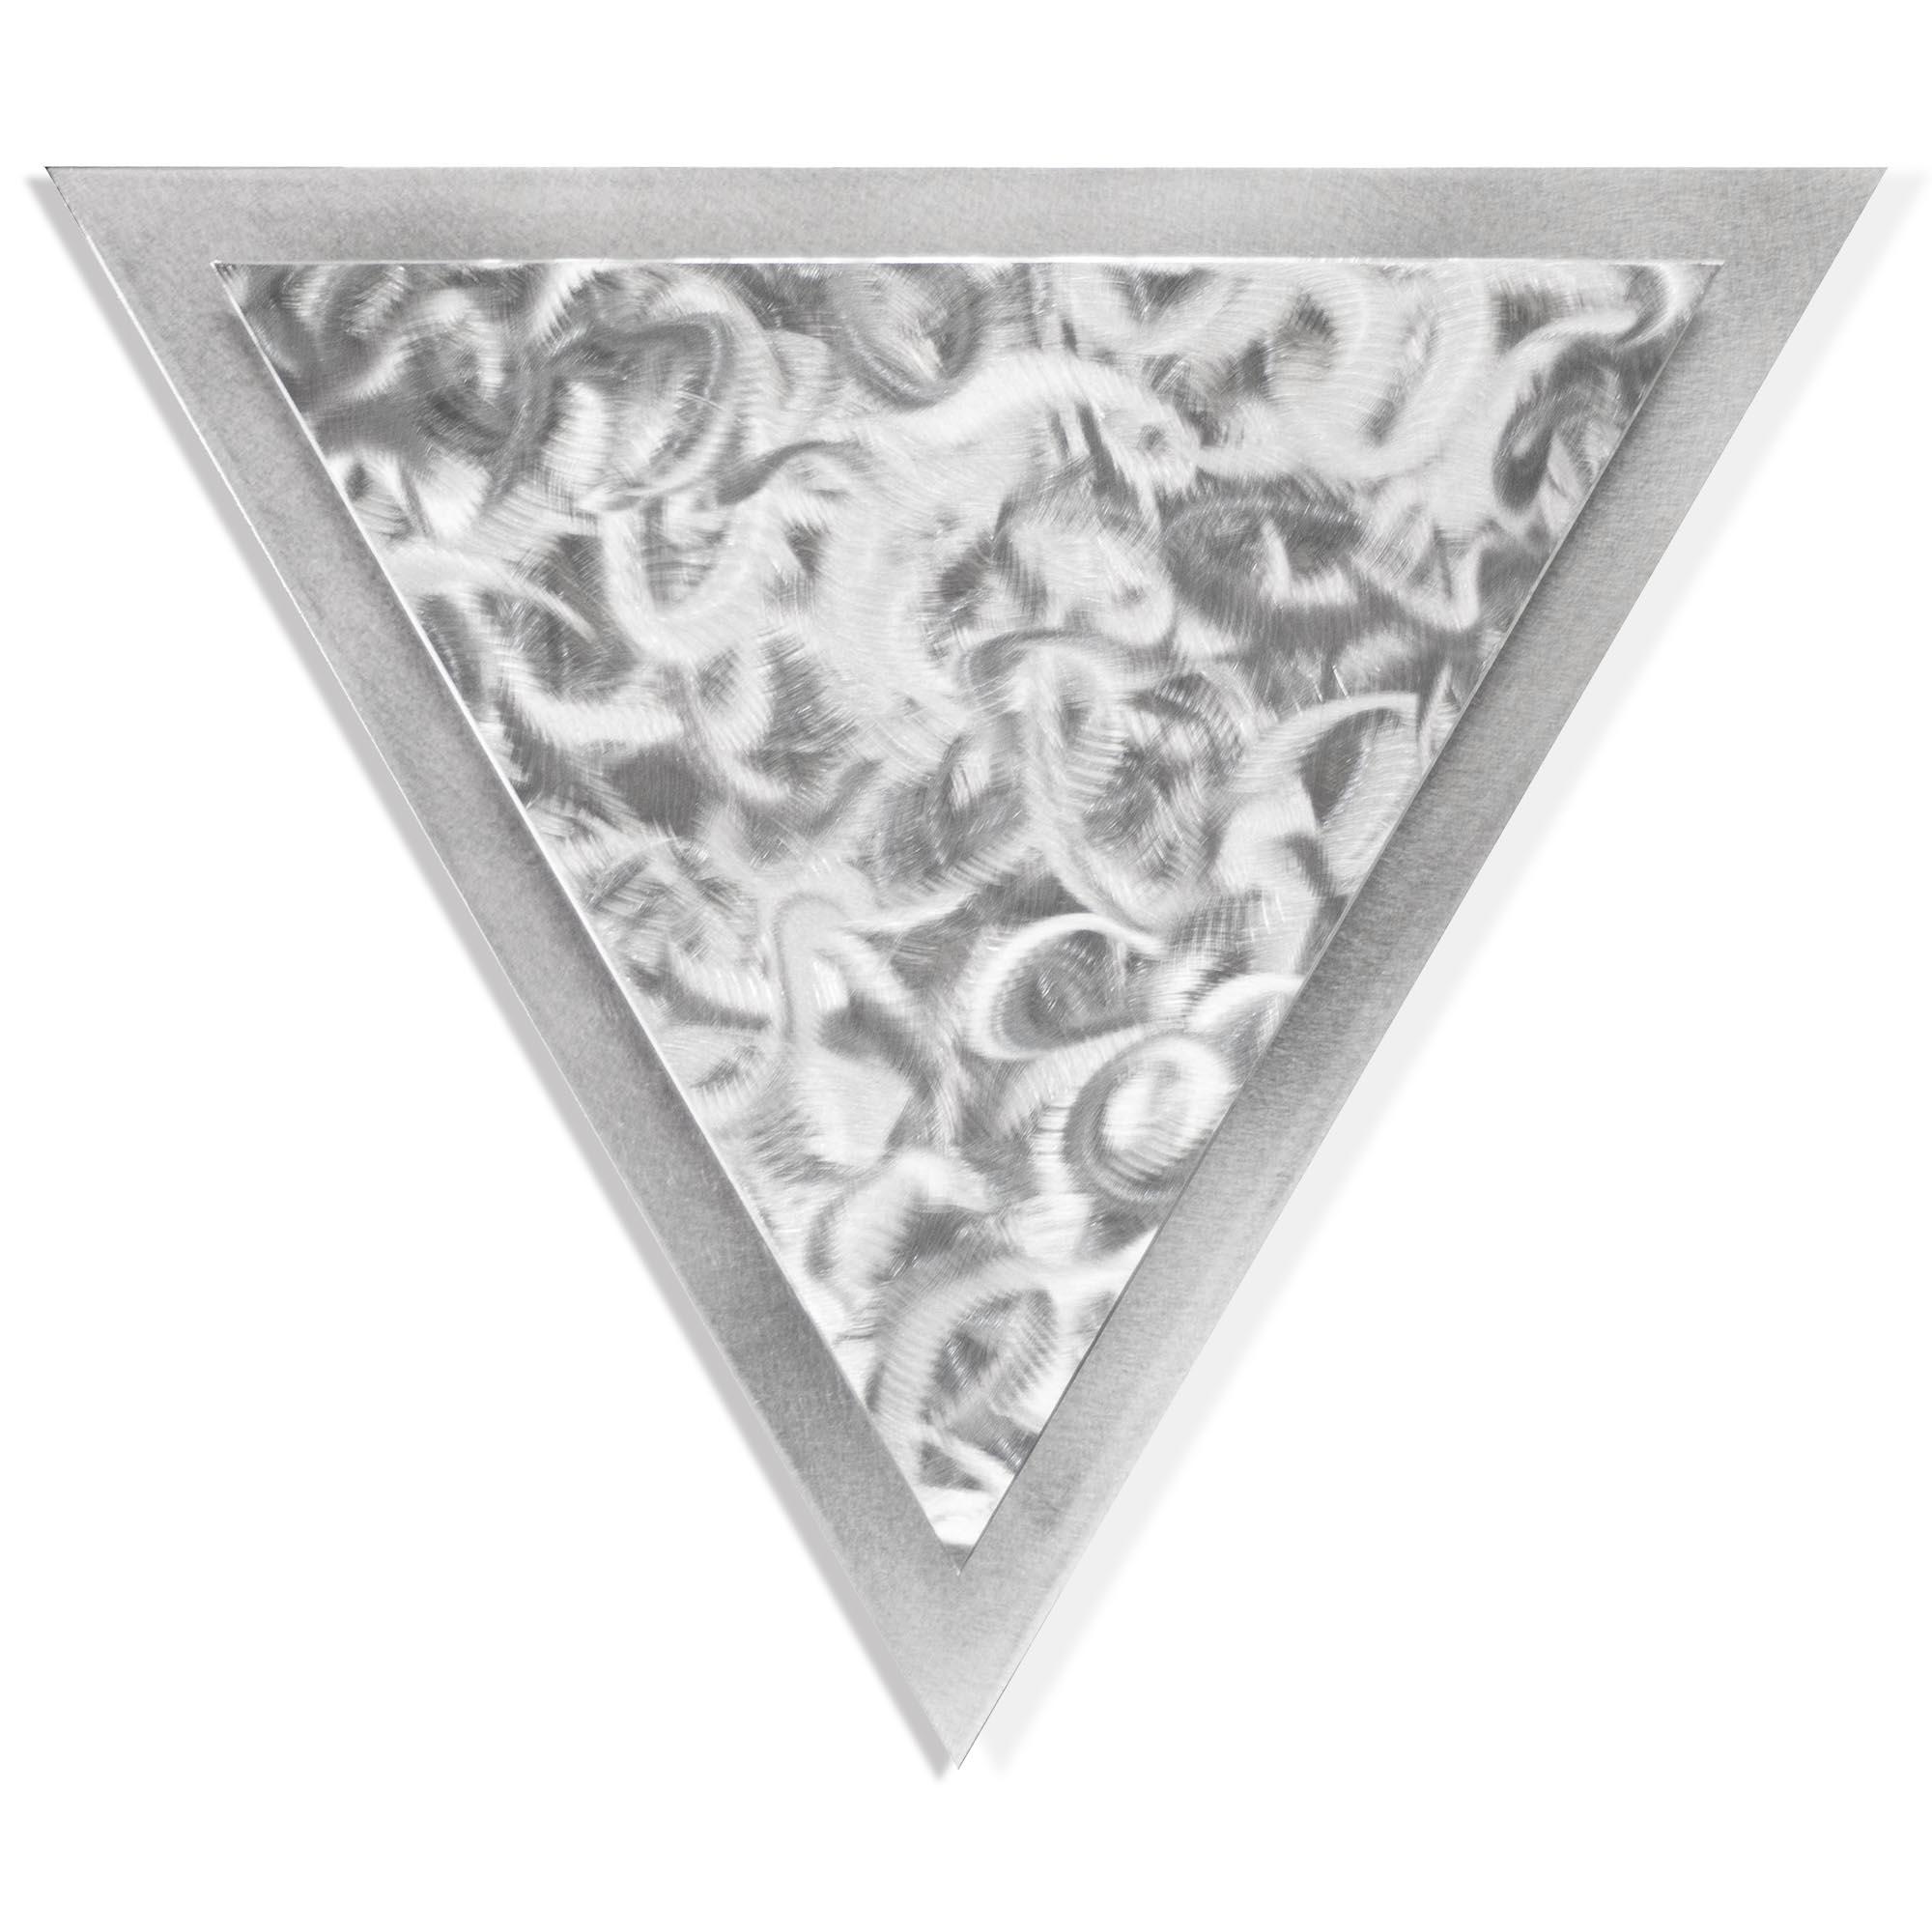 Helena Martin 'Twirled Angle' 15in x 13in Modern Metal Art on Ground Metal